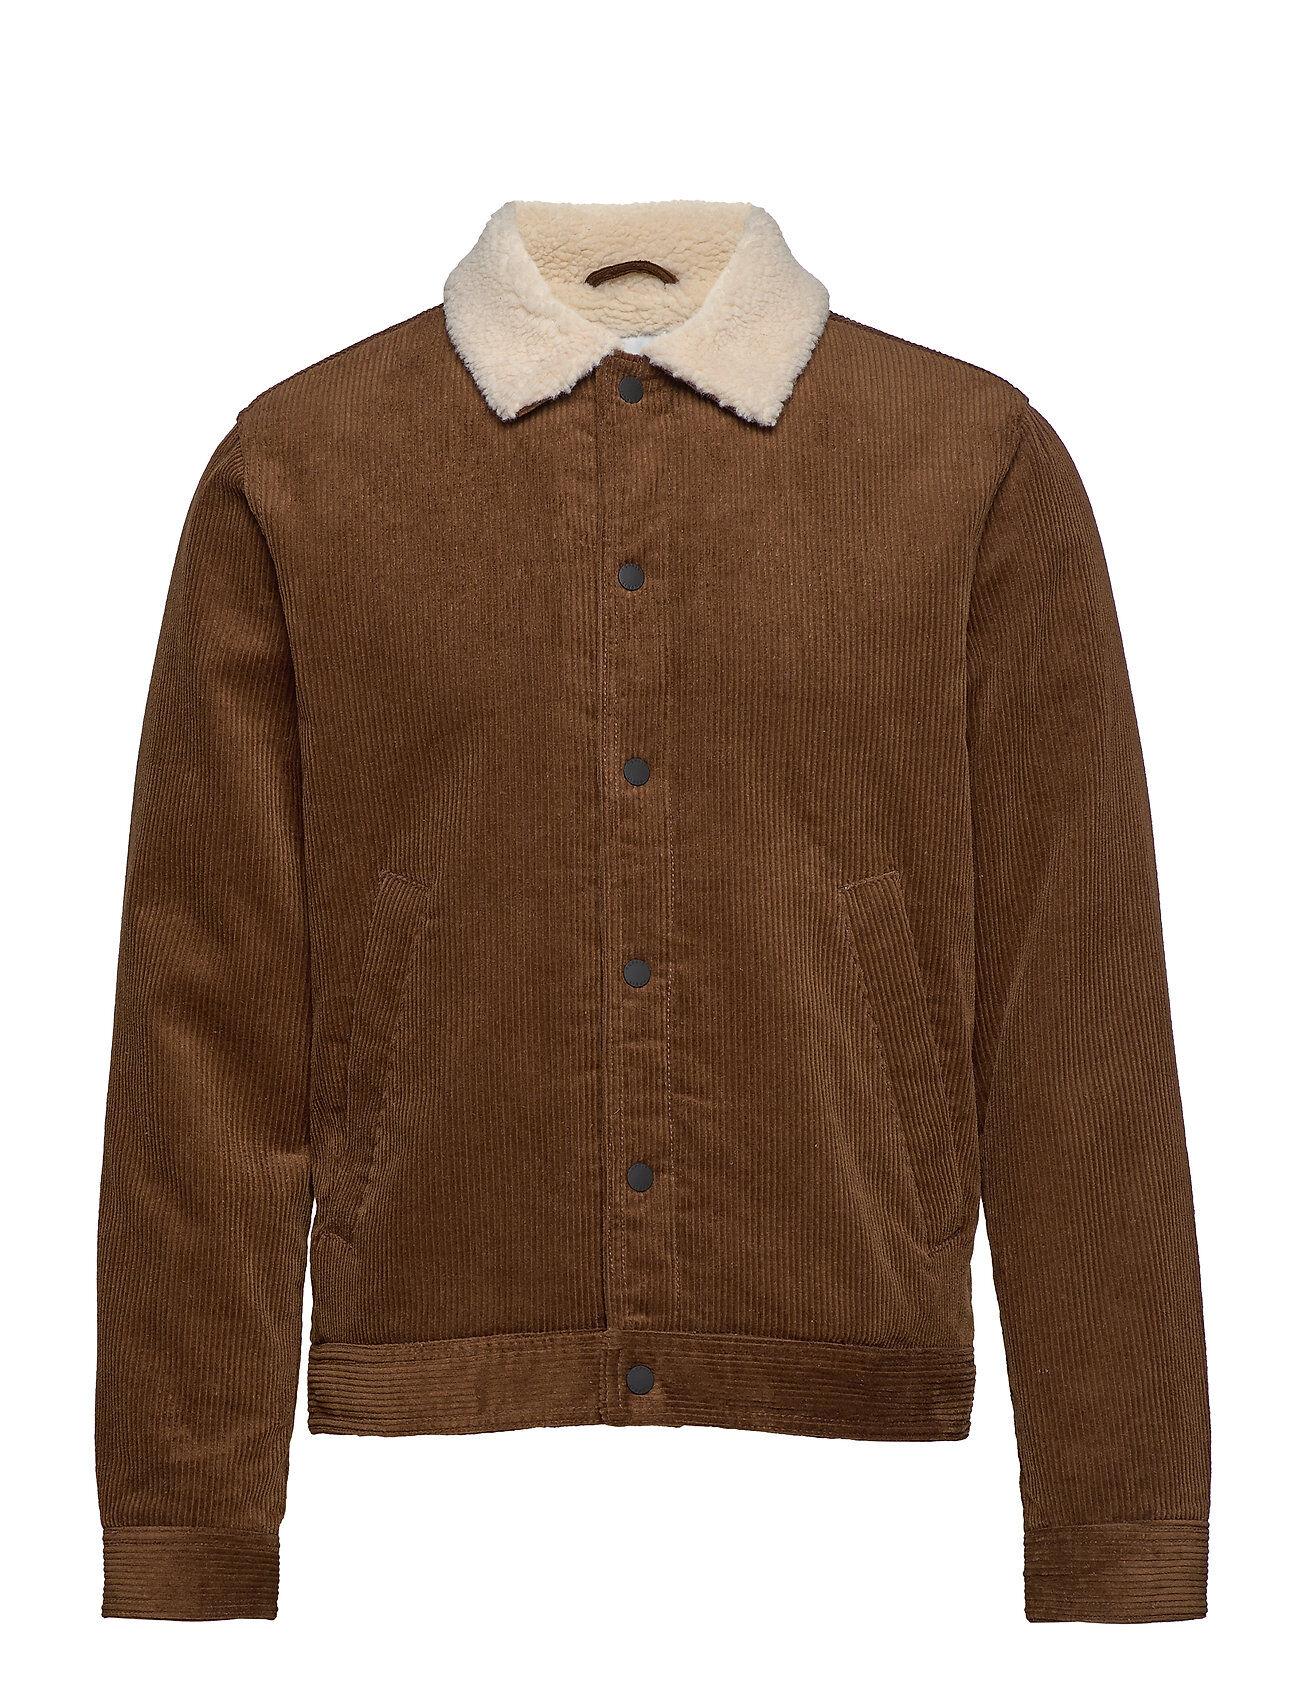 Image of Esprit Casual Jackets Outdoor Woven Farkkutakki Denimtakki Ruskea Esprit Casual